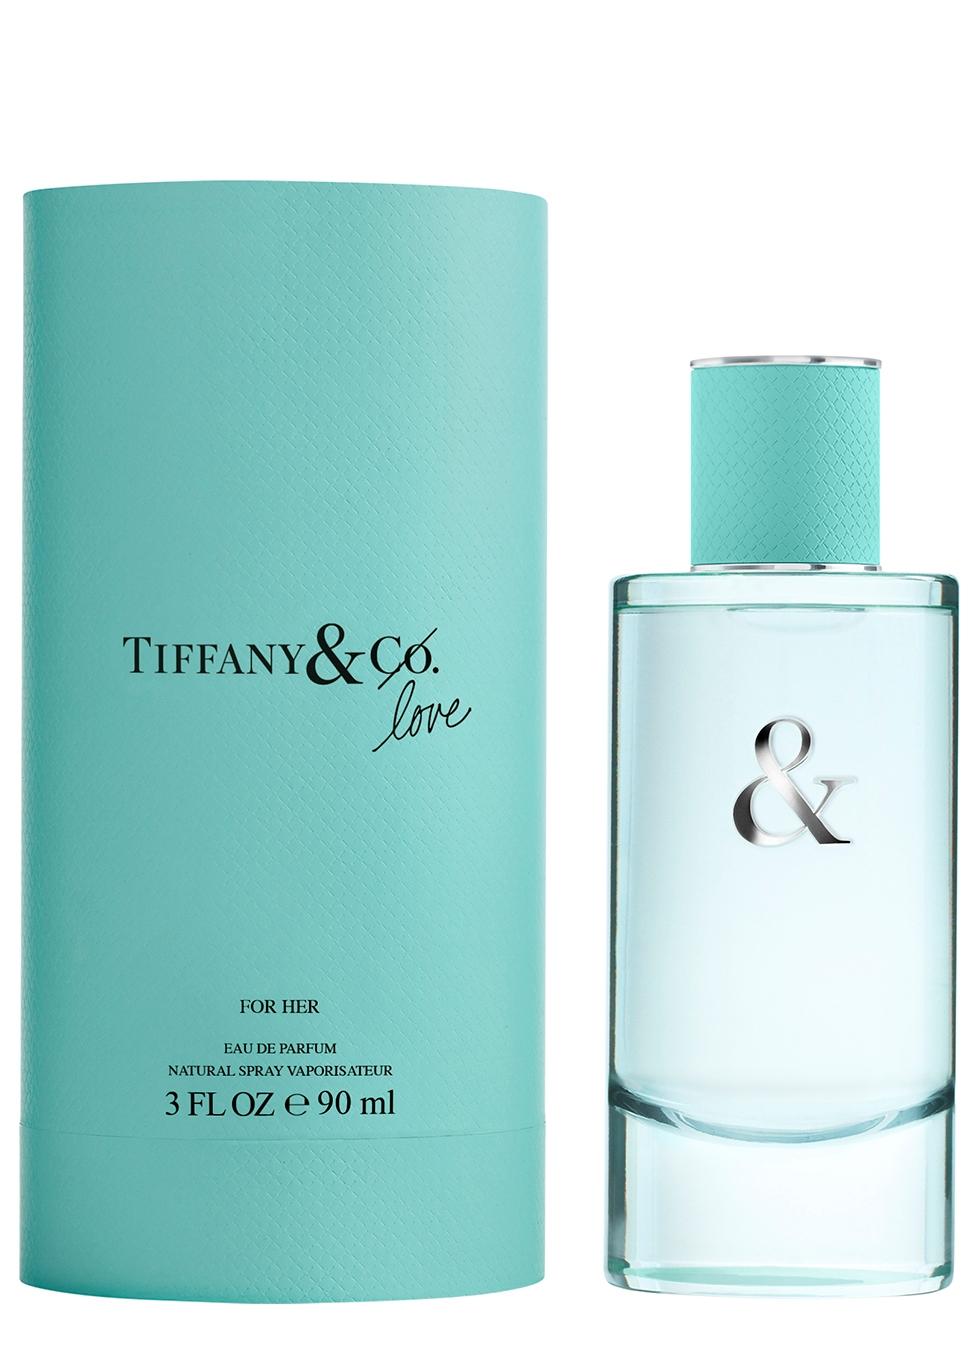 Tiffany & Co Tiffany & Love For Him Eau